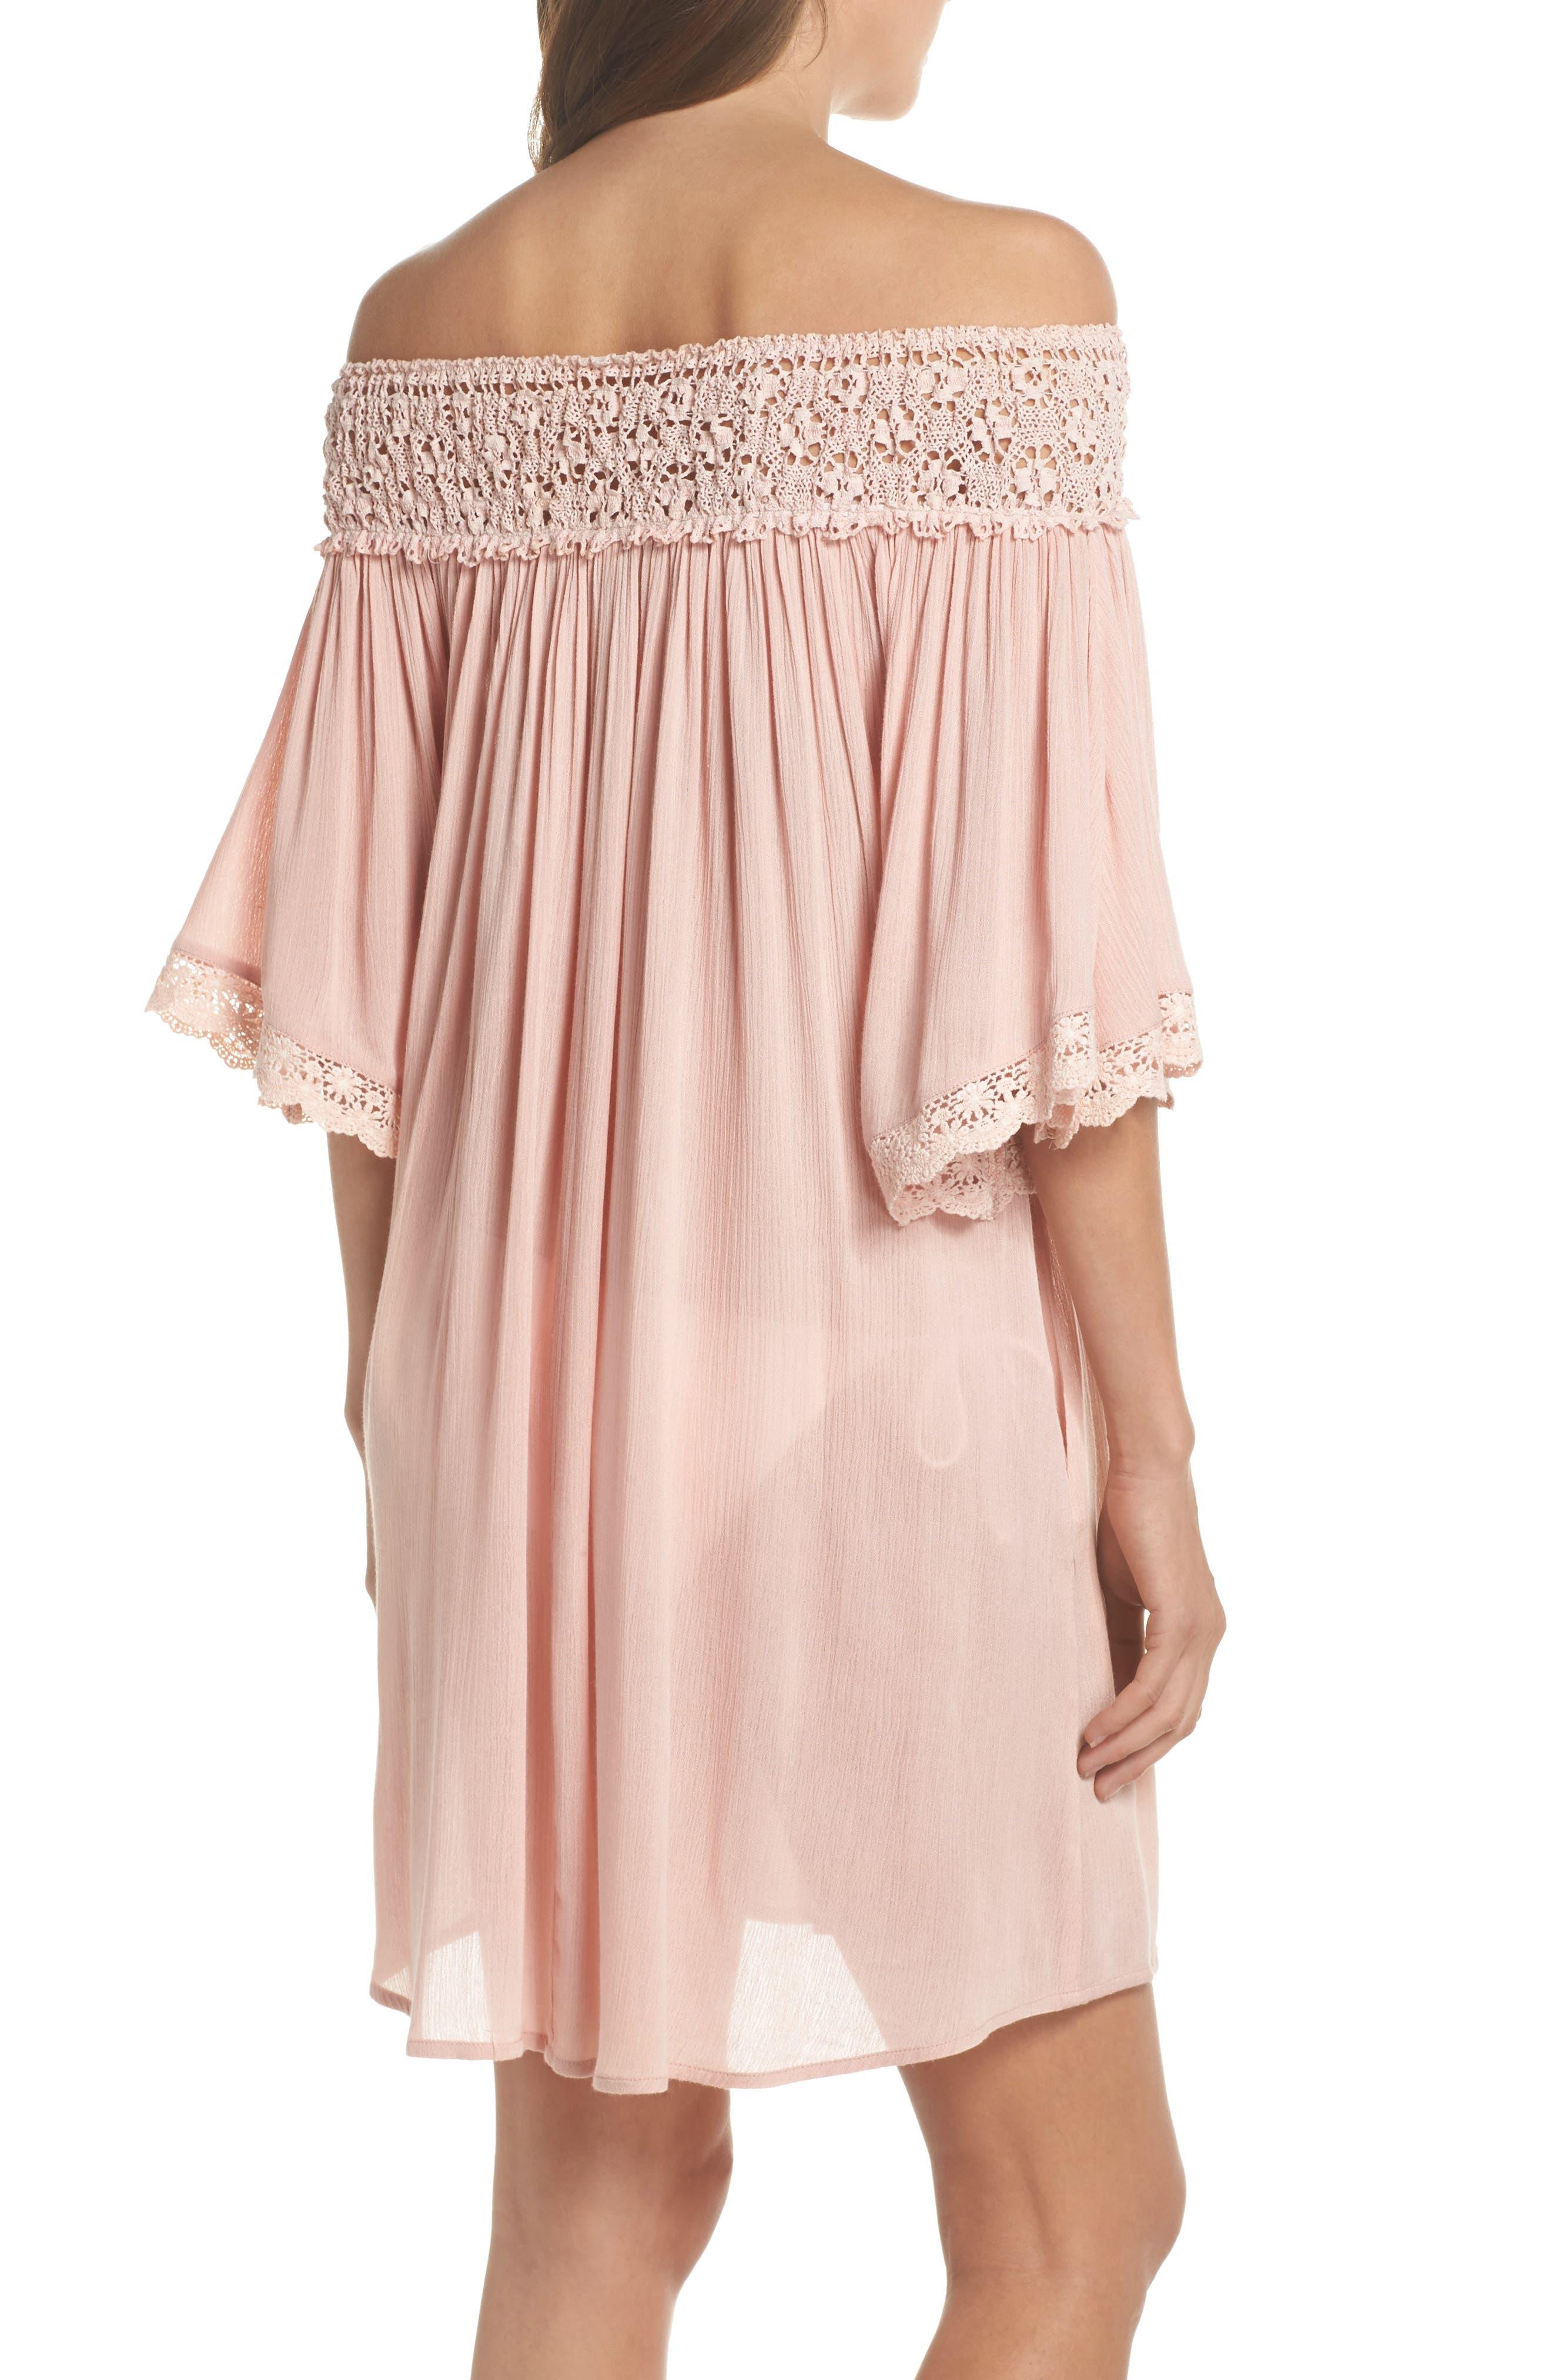 Rimini Crochet Cover-Up Dress,                             Alternate thumbnail 4, color,